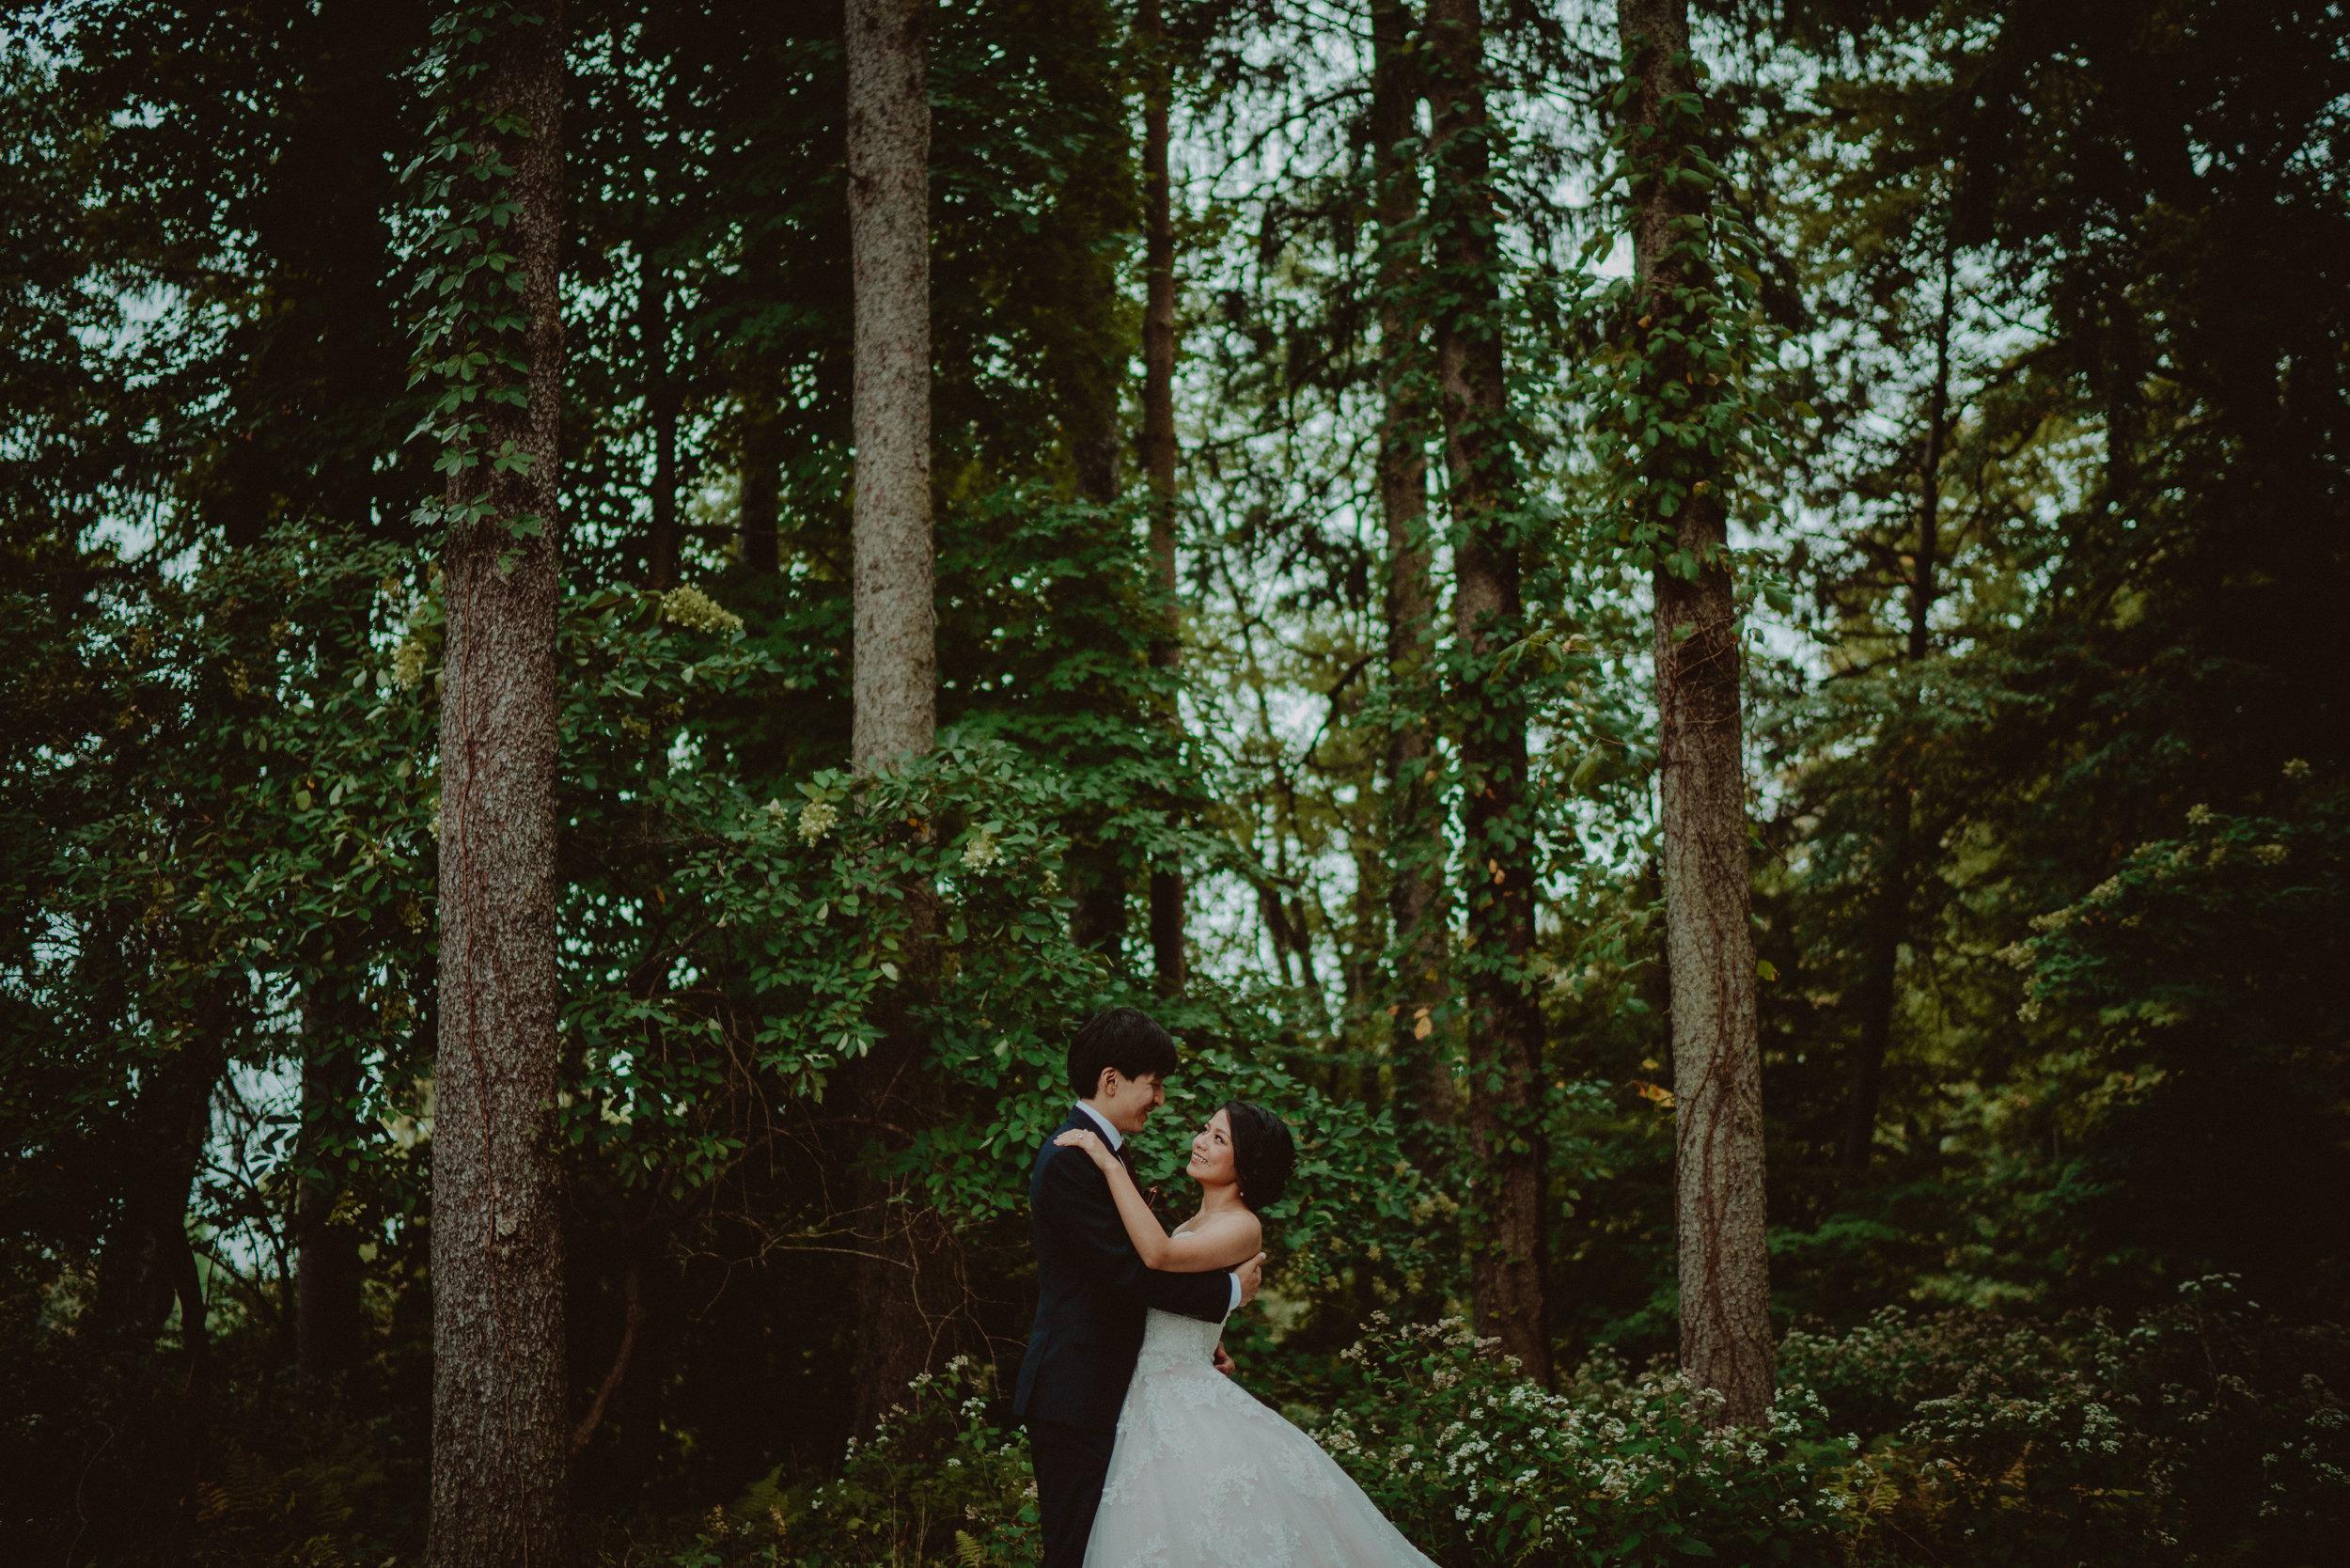 Irene-and-Jae-2019_Brooklyn_Wedding_Photographer_Chellise_Michael_Photography--55.jpg